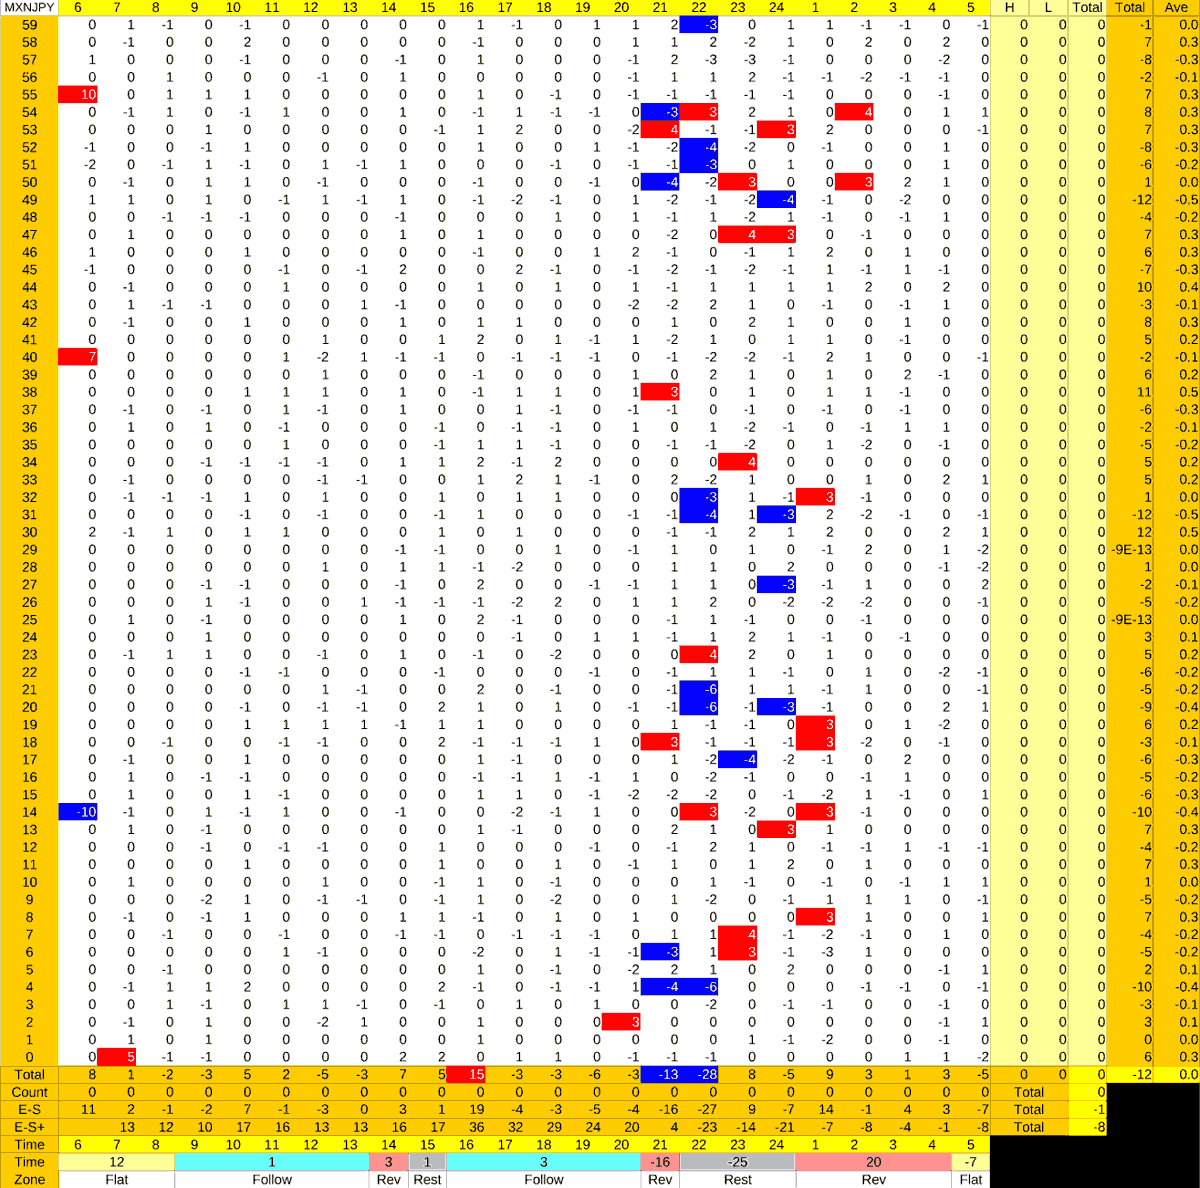 20210429_HS(3)MXNJPY